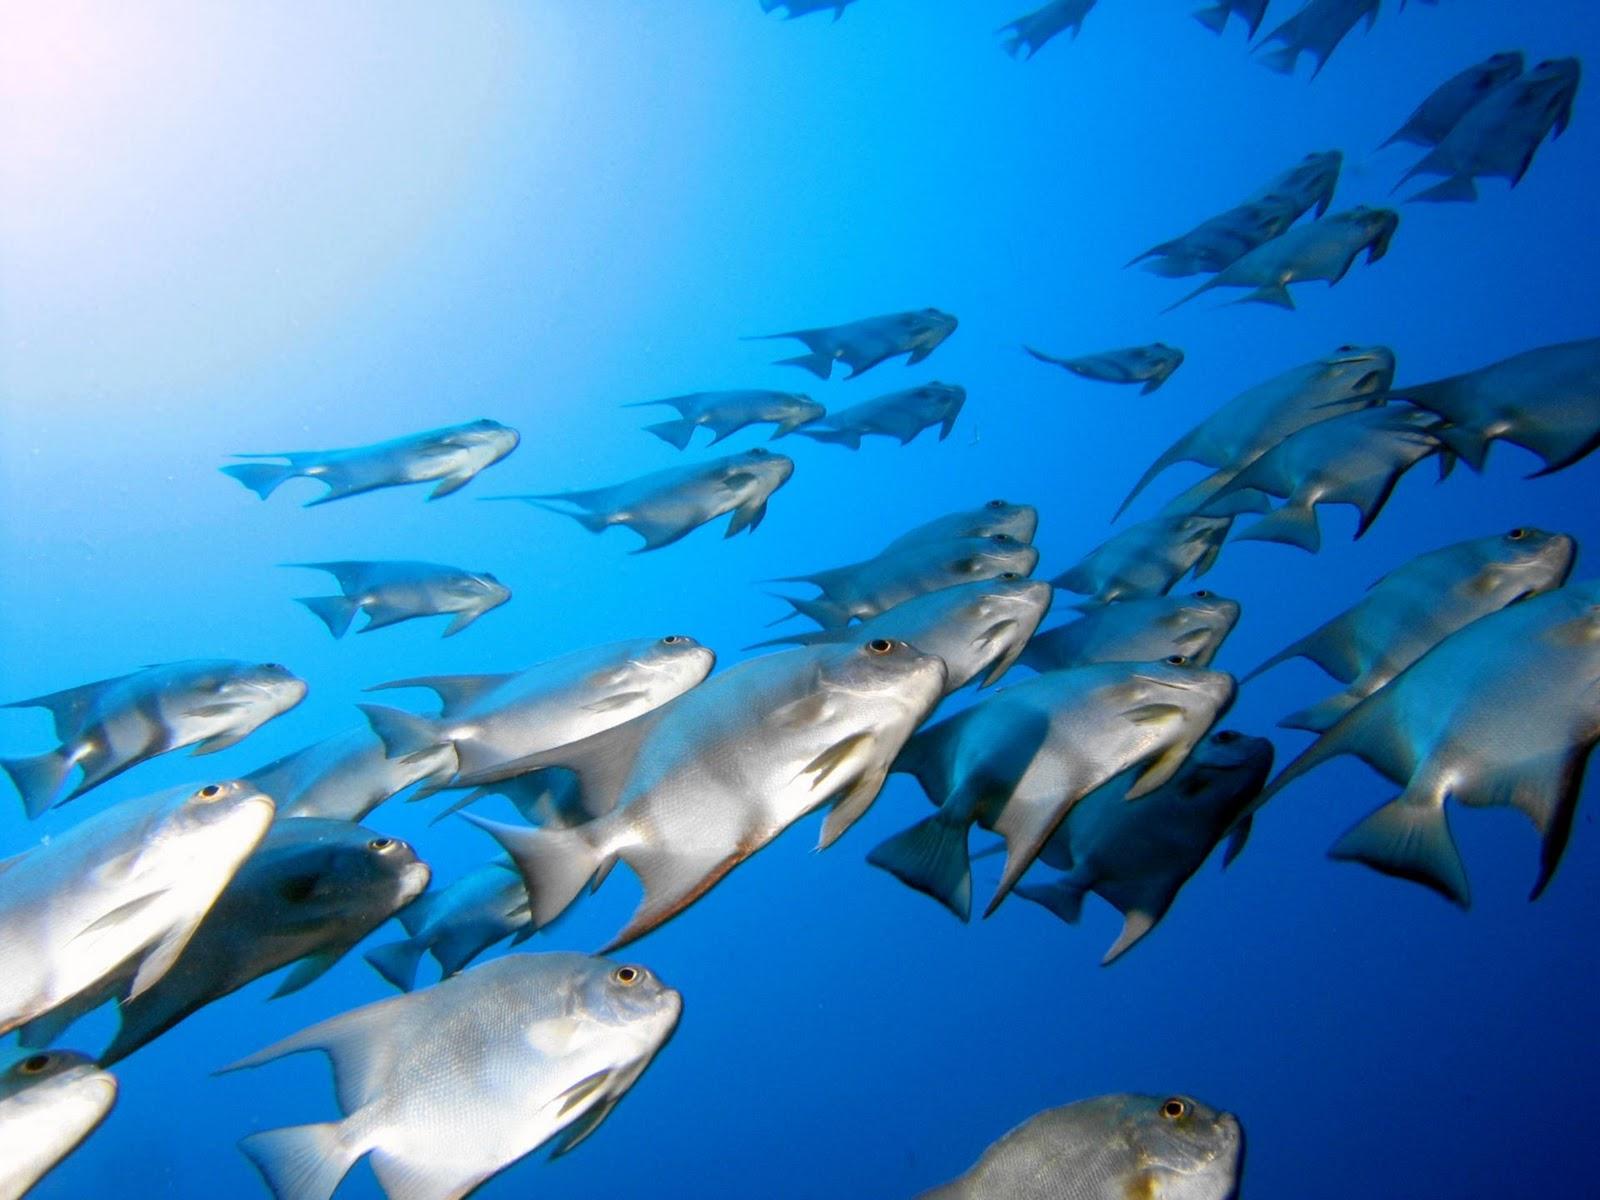 Free hd Wallpapers: Beautiful Sea World HD Natural Wallpapers